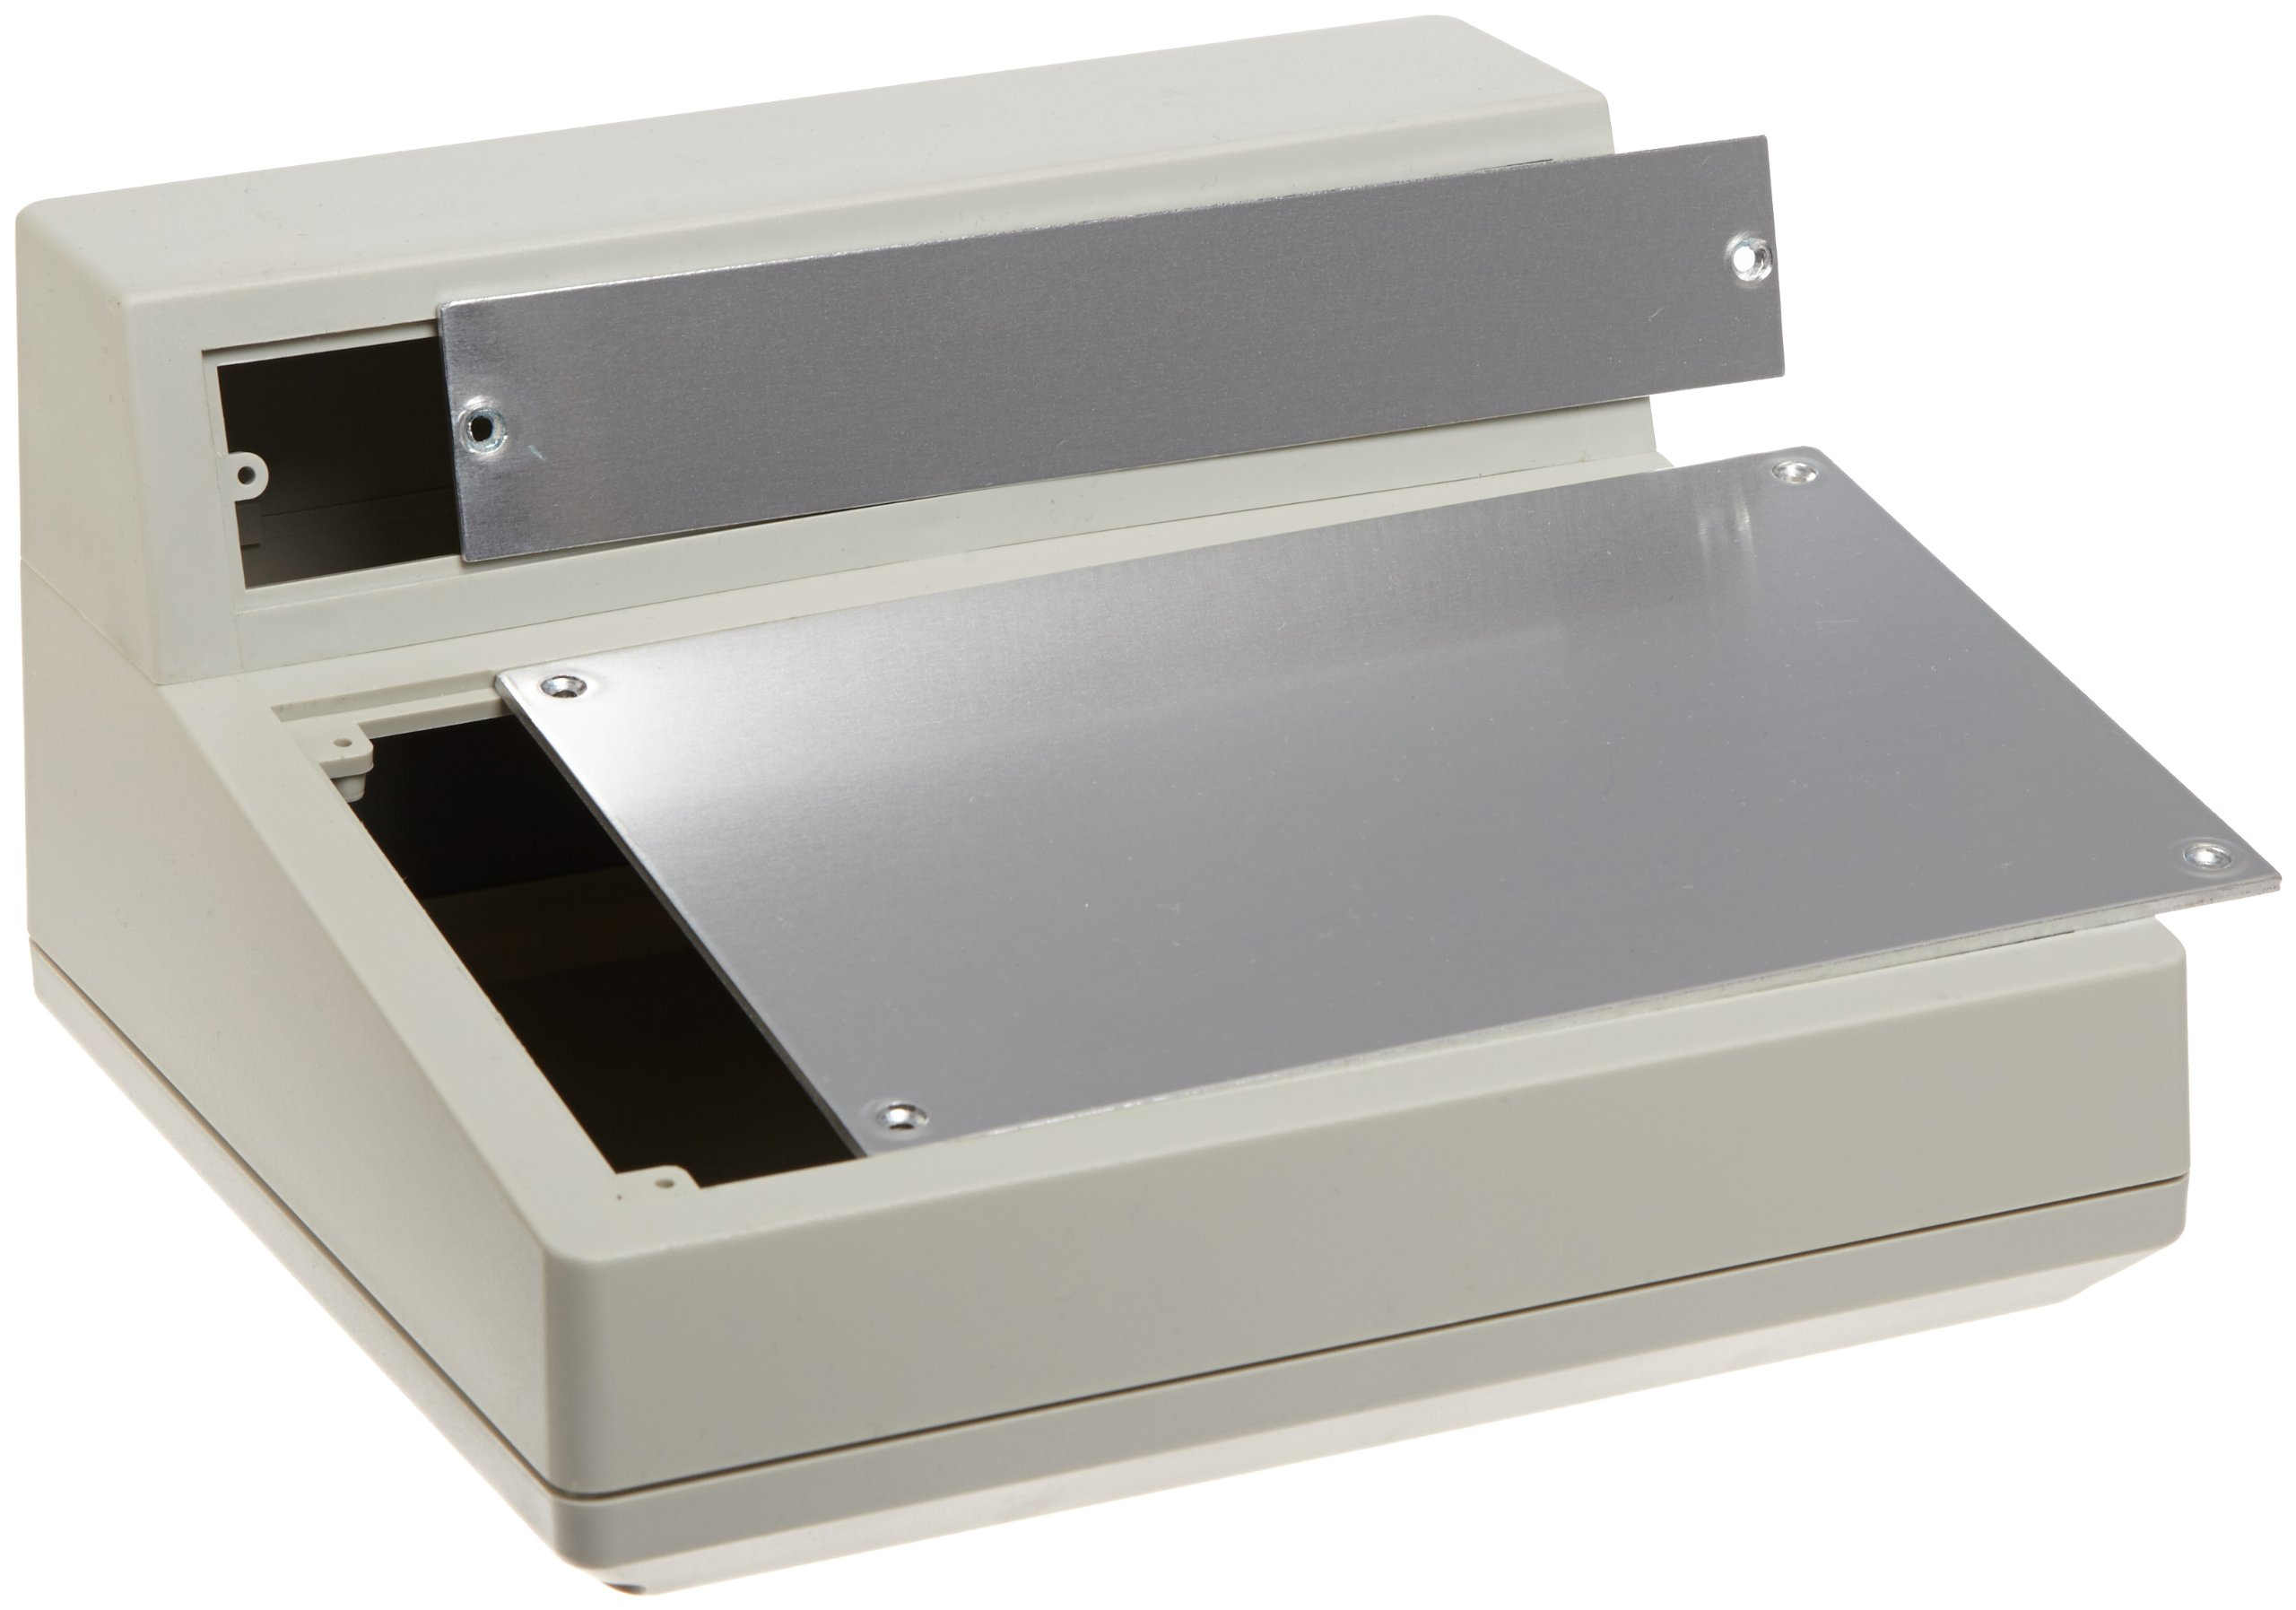 BUD Industries PC-11495 Plastic Style F Box, 9'' Width x 5'' Height x 8-1/2'' Depth, Natural Finish